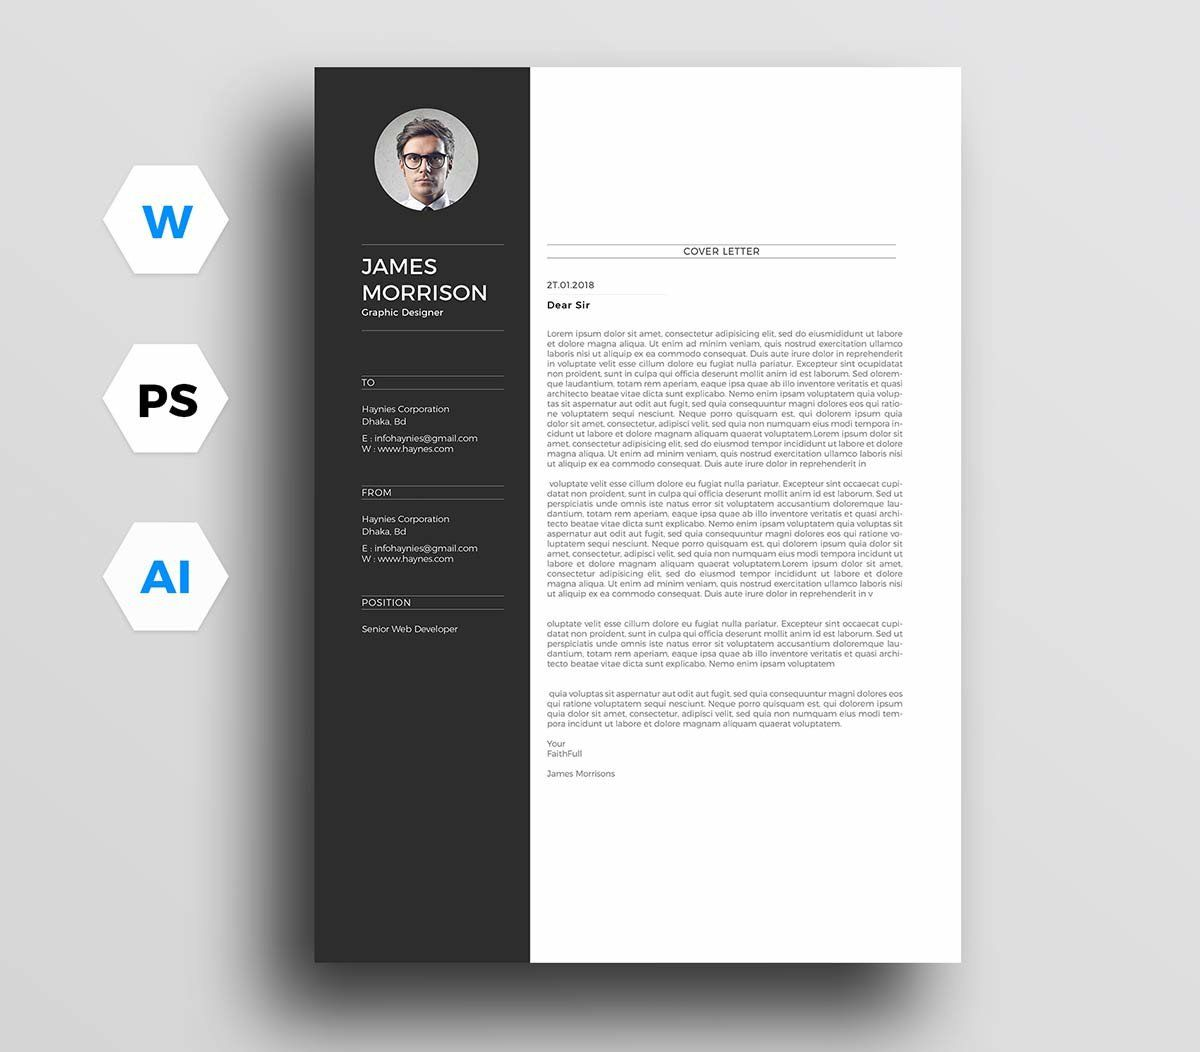 004 Sensational Resume Cover Letter Template Word Free High Resolution Full